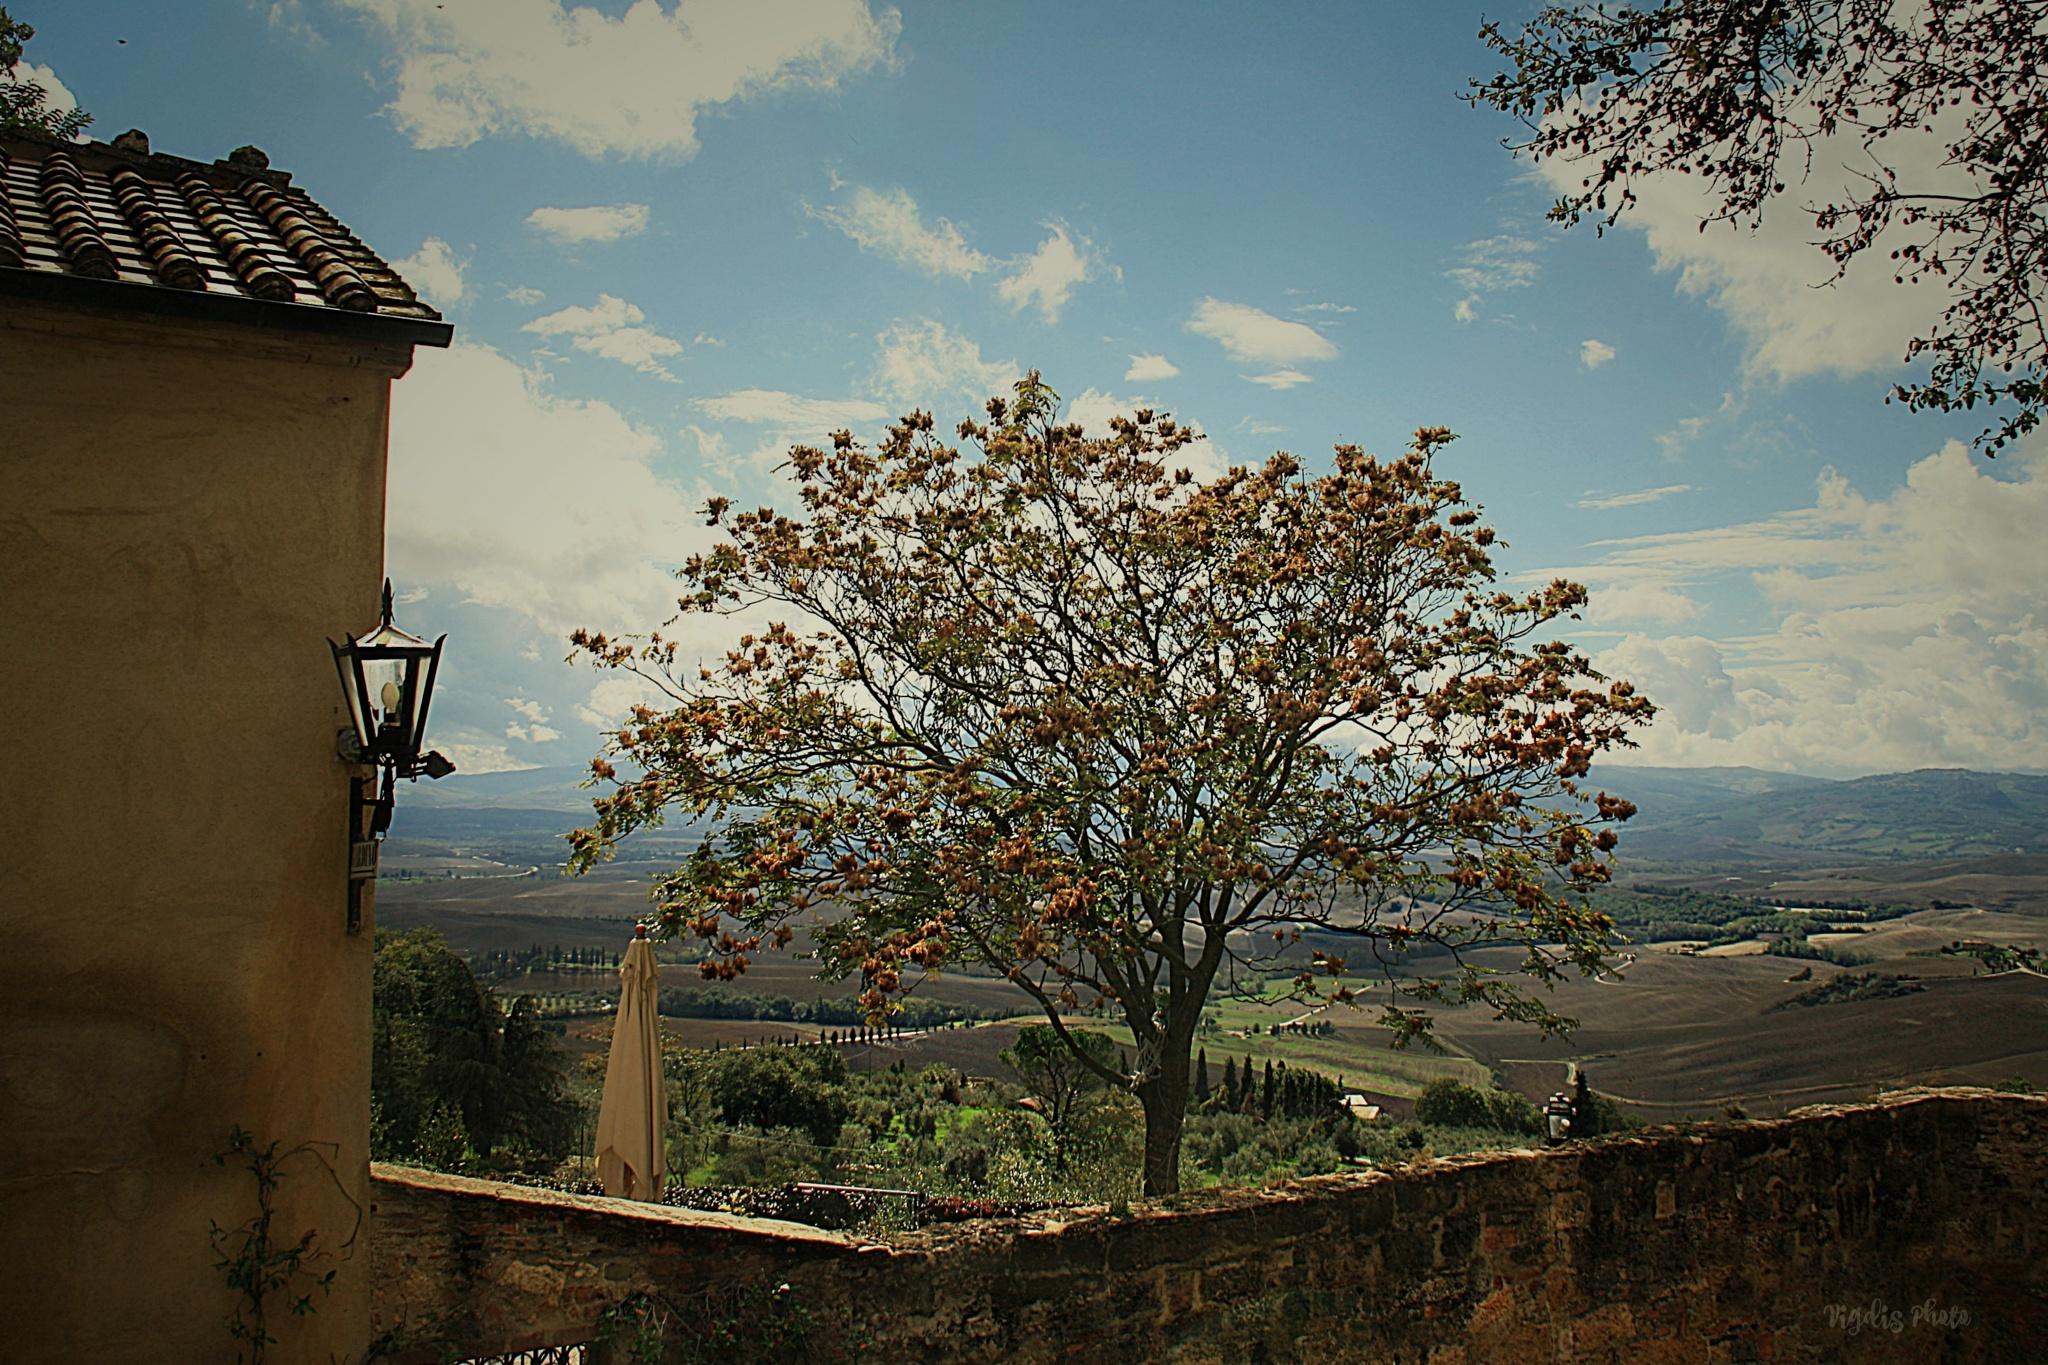 Landscape in Tuscany by Vigdis Westgård